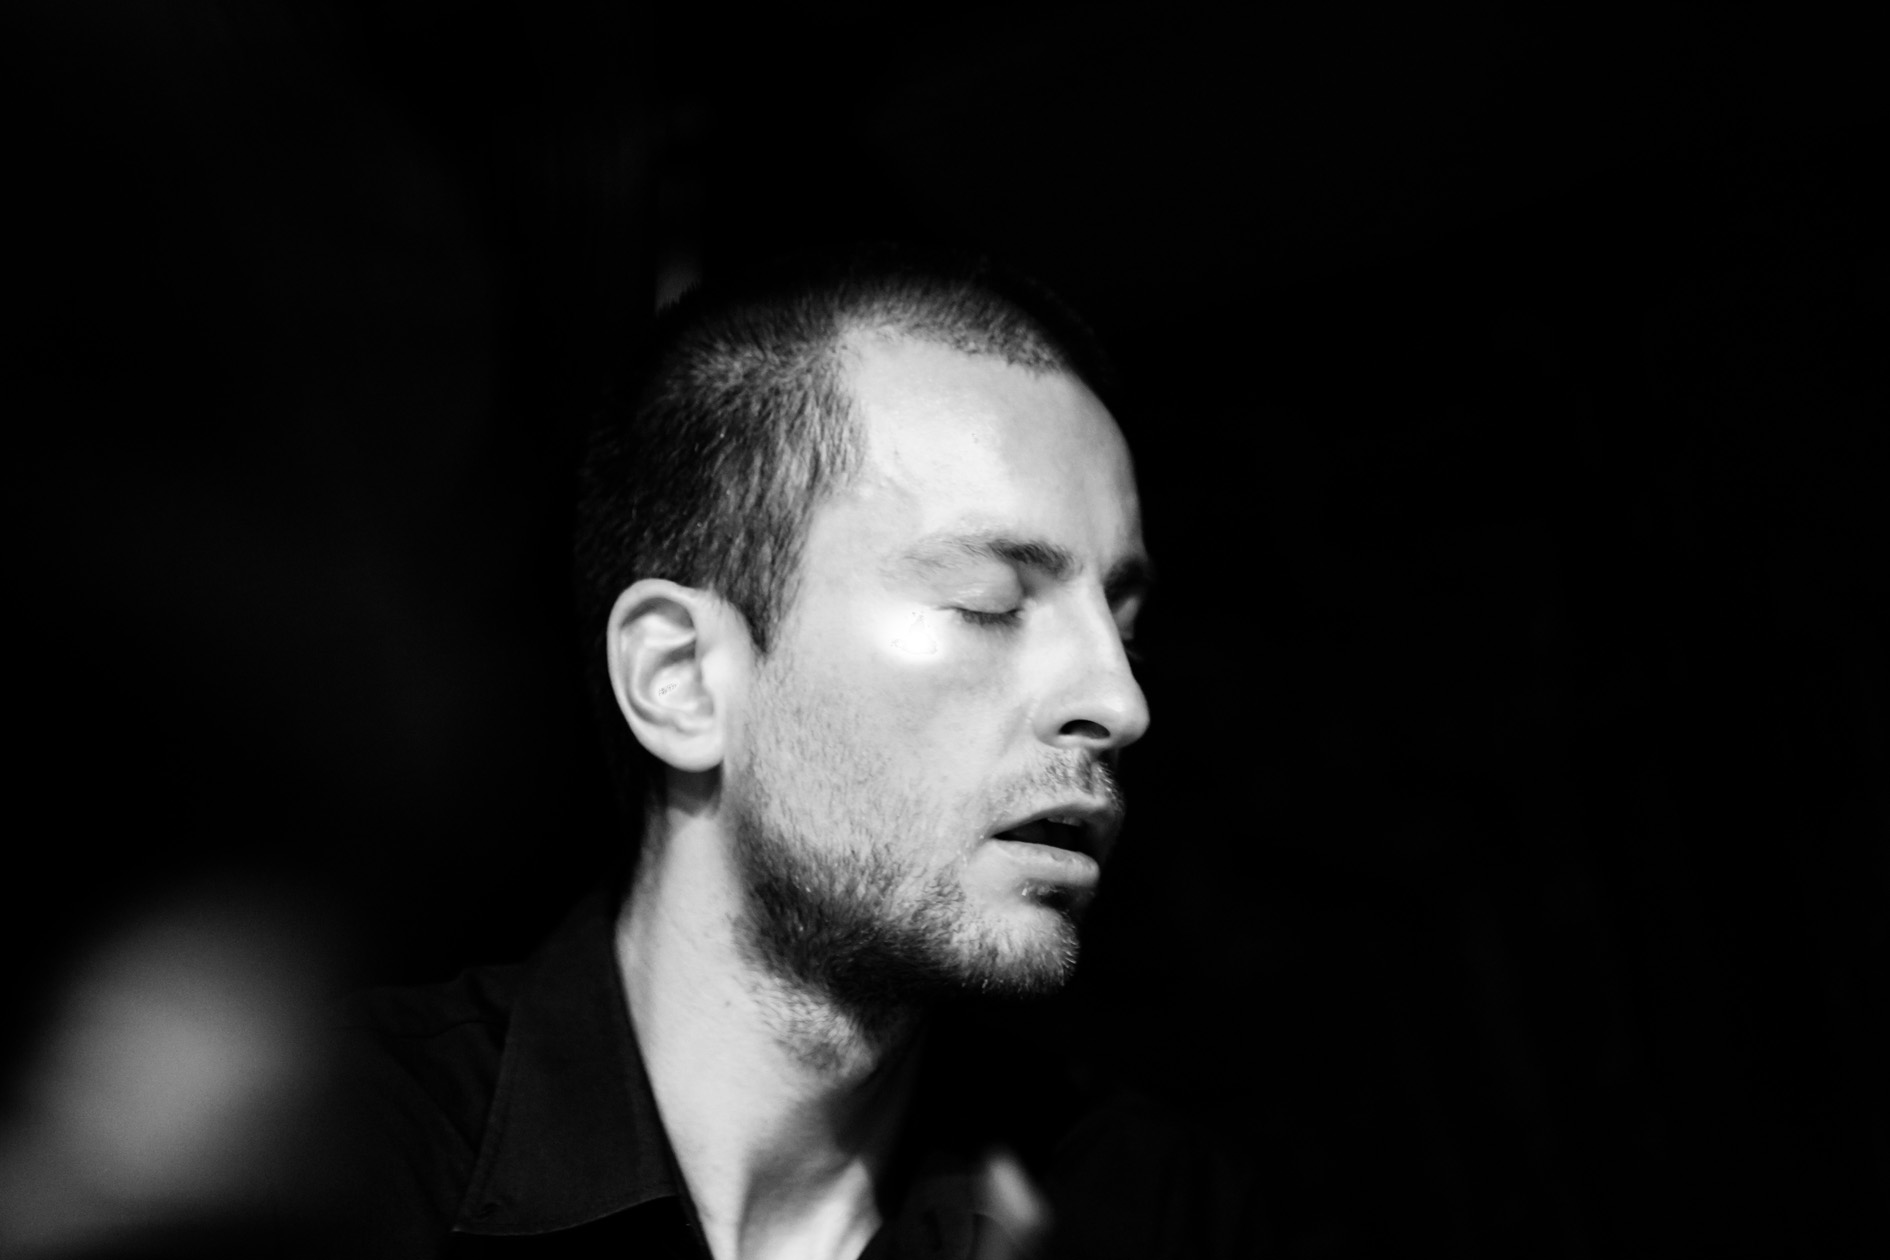 Tobias Schirmer